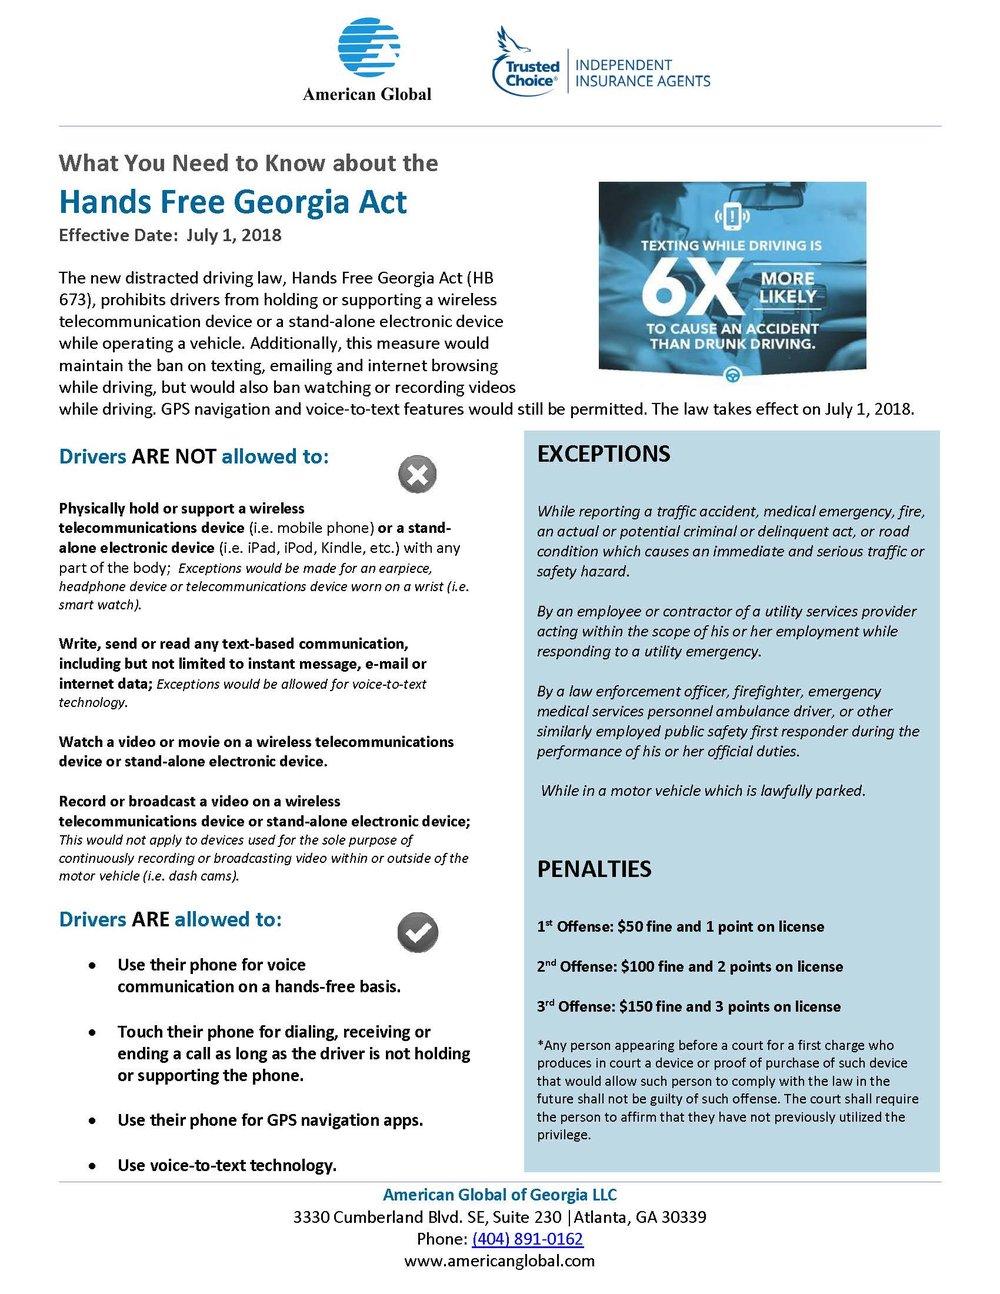 hands_free_georgia_act.jpg